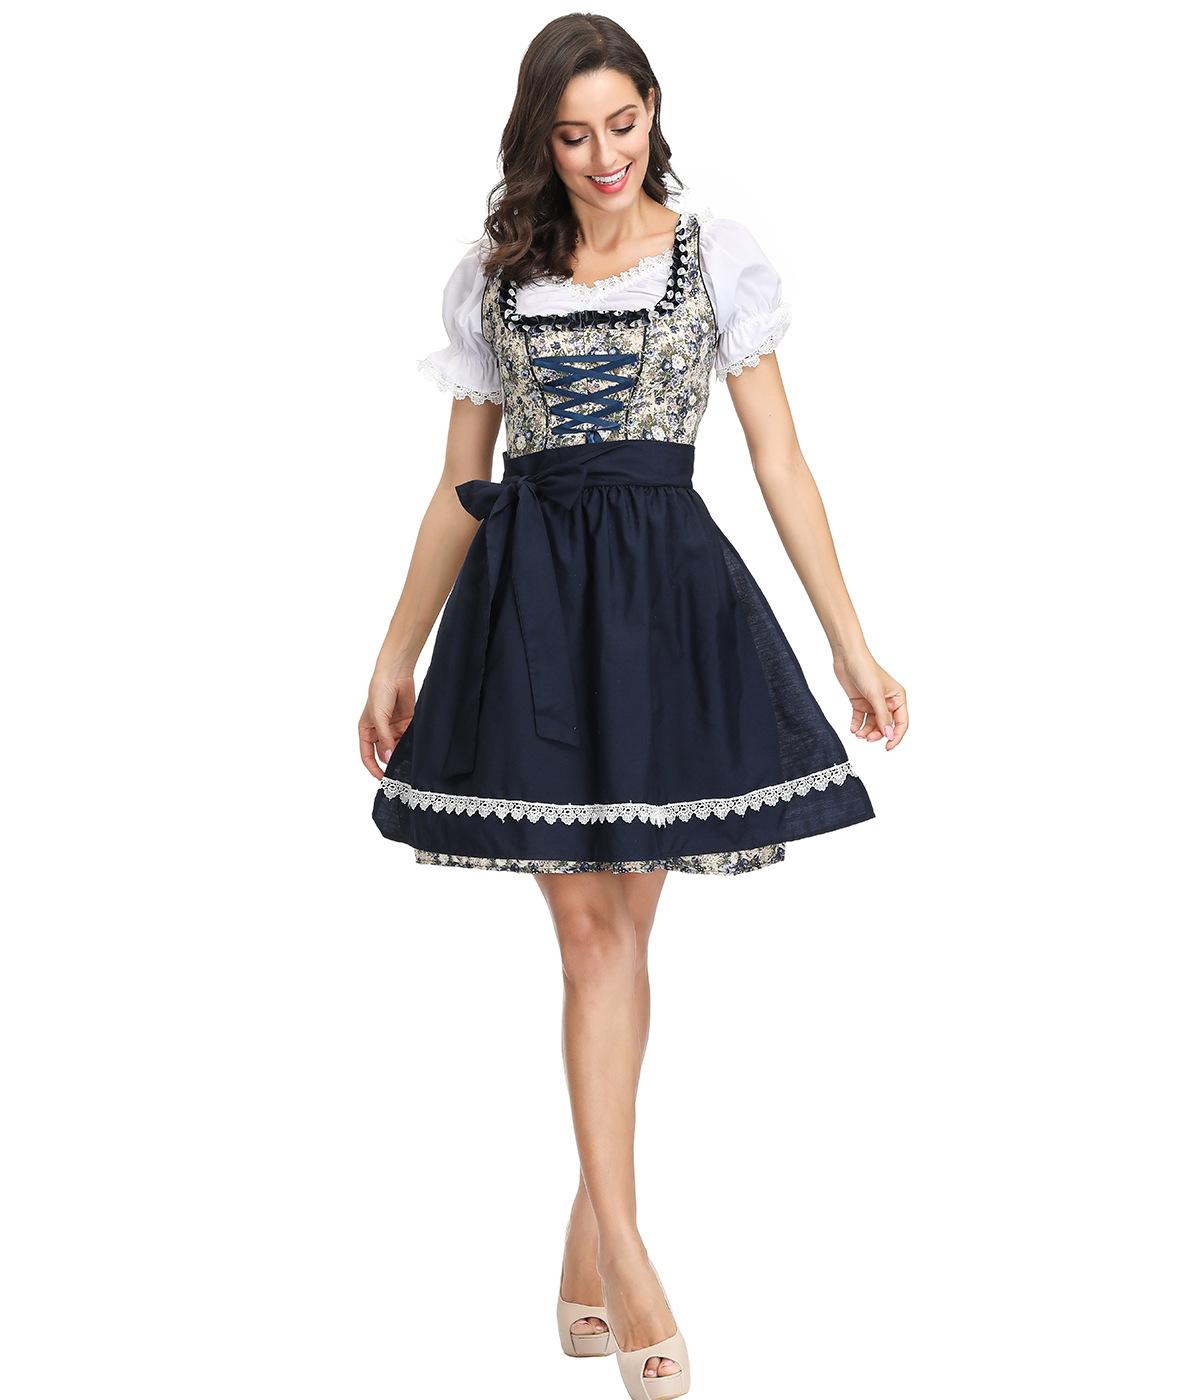 3pcs/set Women Oktoberfest Dirndl Lace Edge Maid Cosplay Dress Beer Festival Dress black_XL